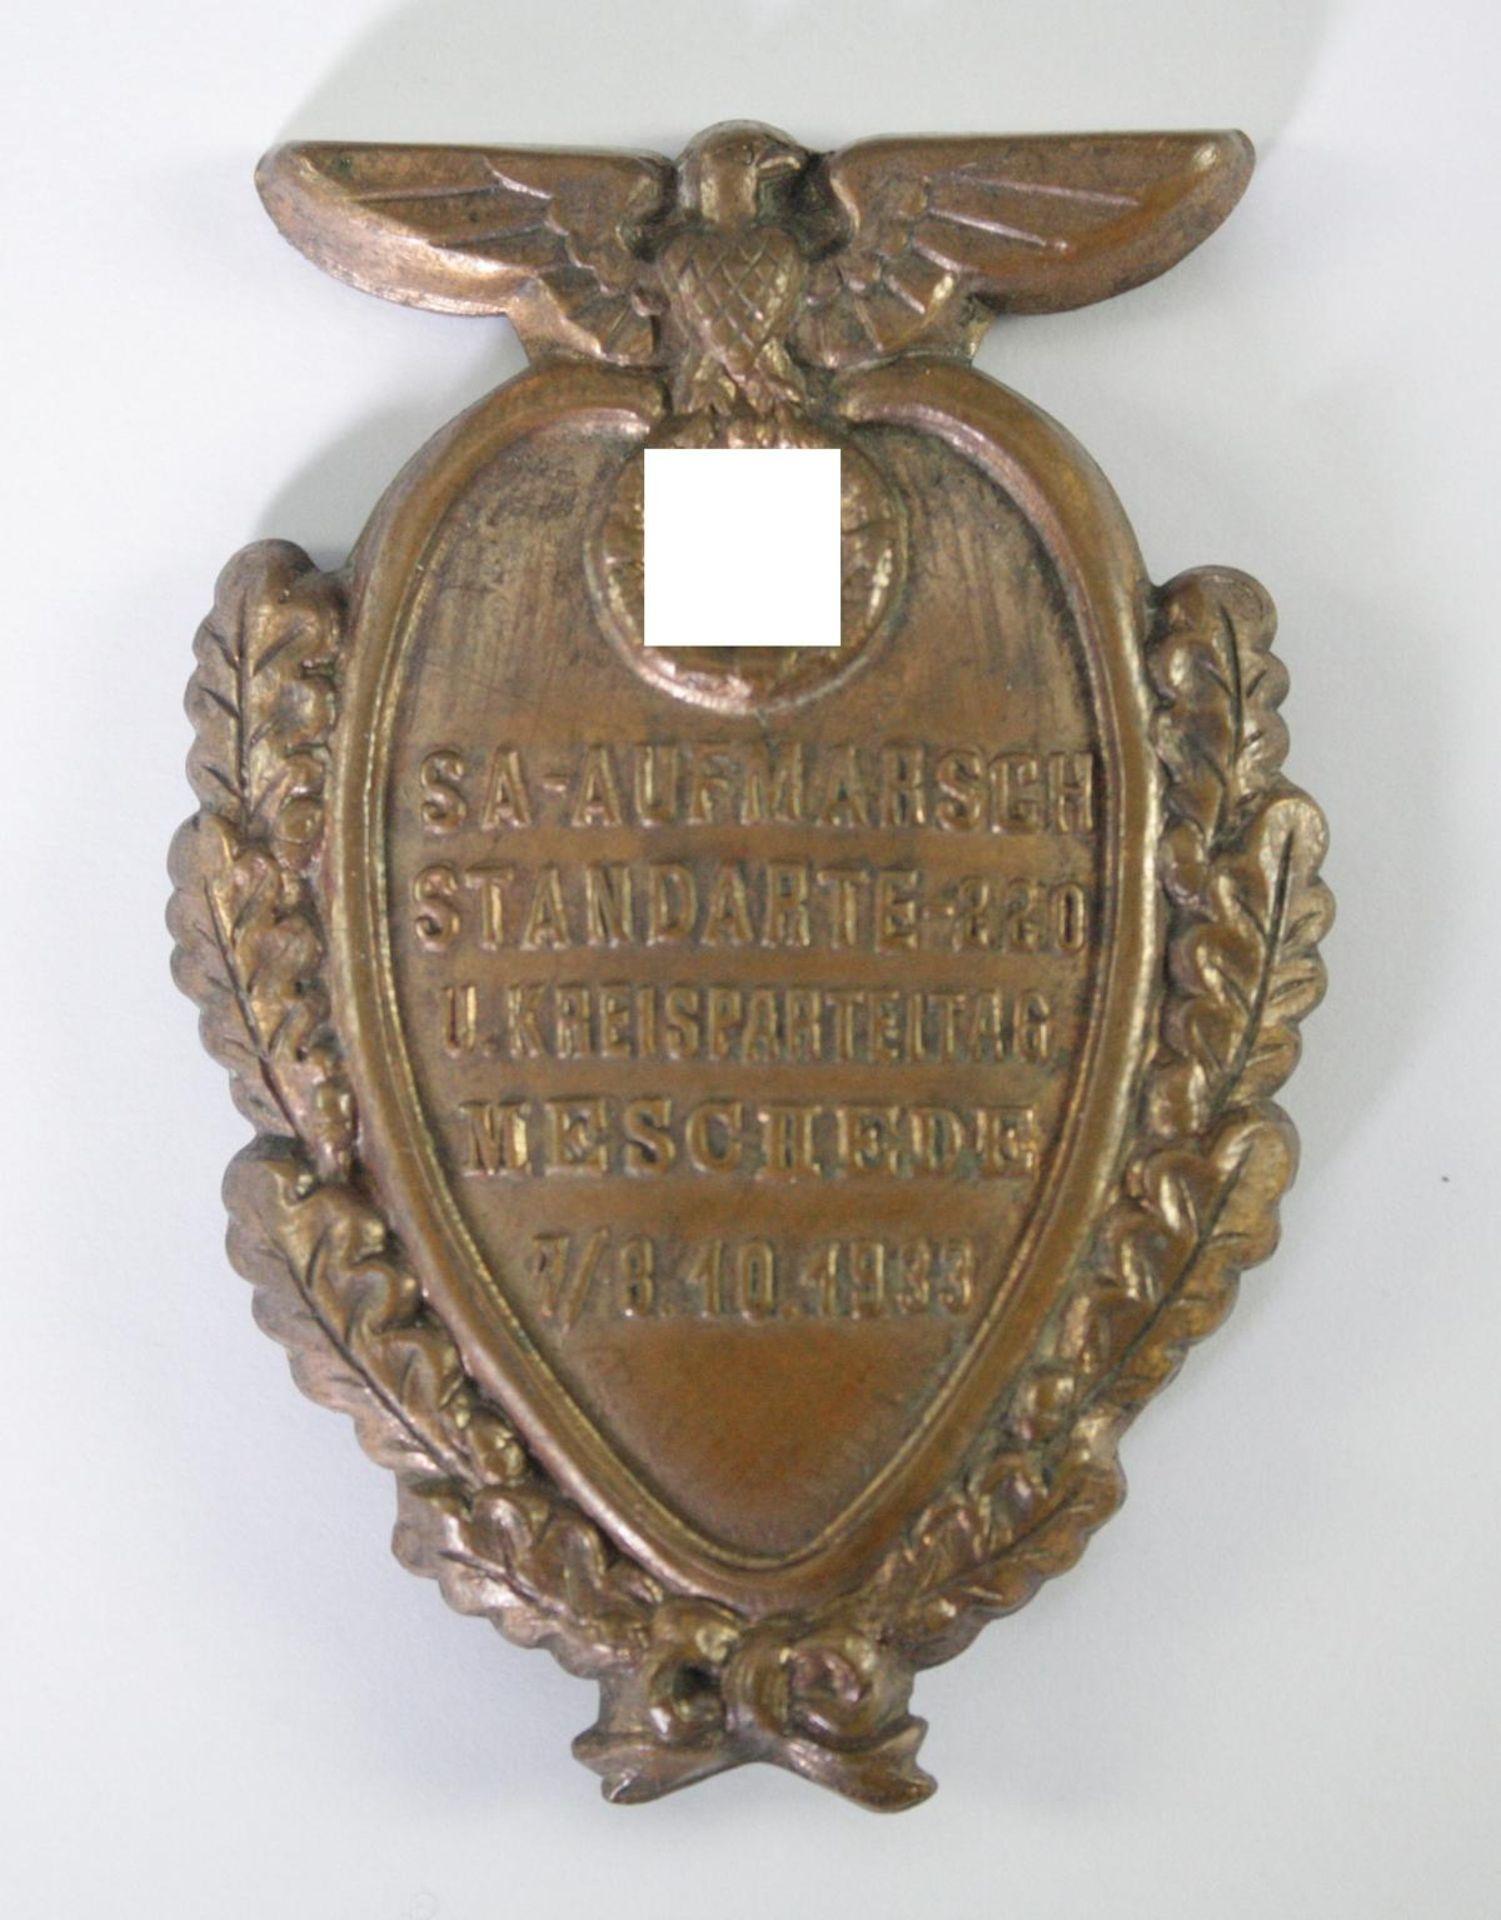 Abzeichen, SA-Aufmarsch Standarte 220 Meschede 1933